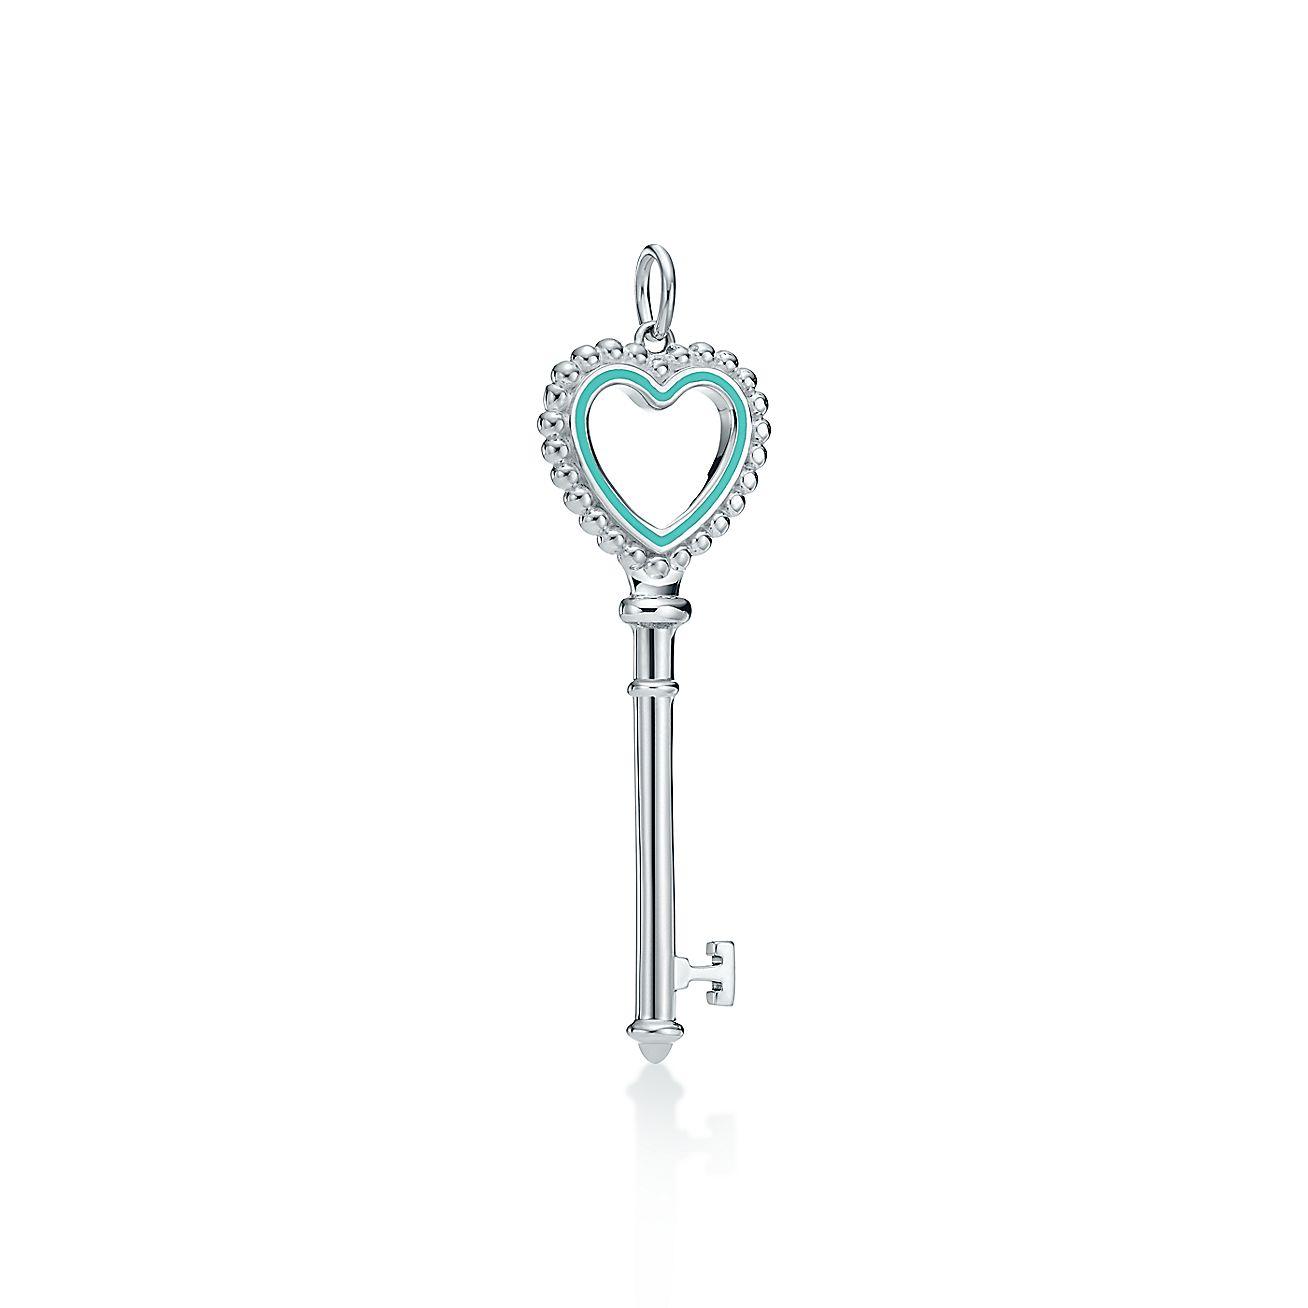 Tiffany Keys Beaded Heart Key Pendant In Sterling Silver With Enamel Finish Tiffany Co